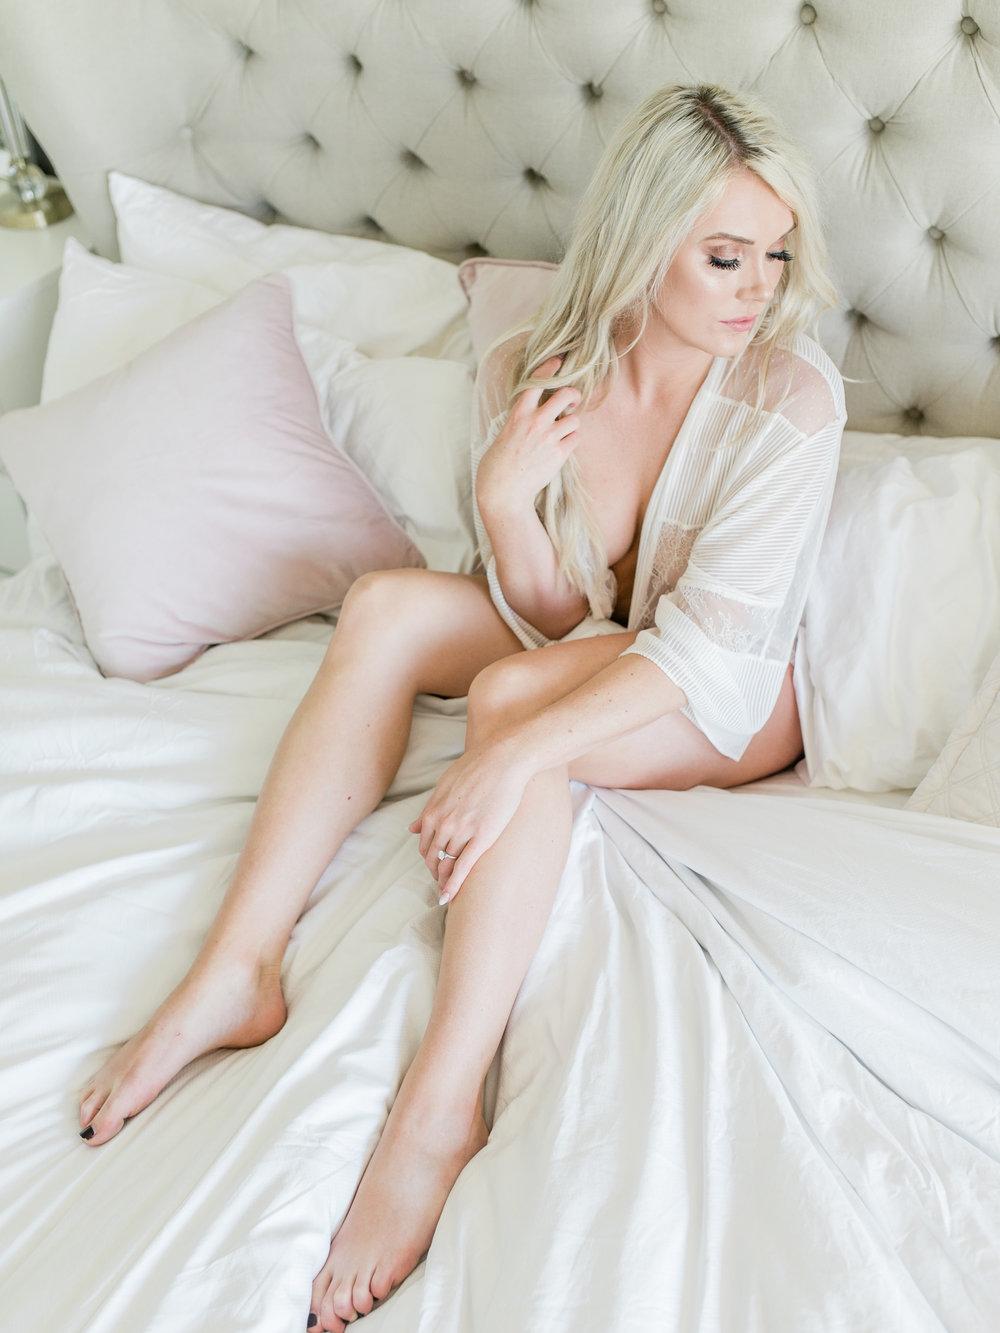 LaurenSinclair_Boudoir_StephanieMasonPhotography-45.jpg